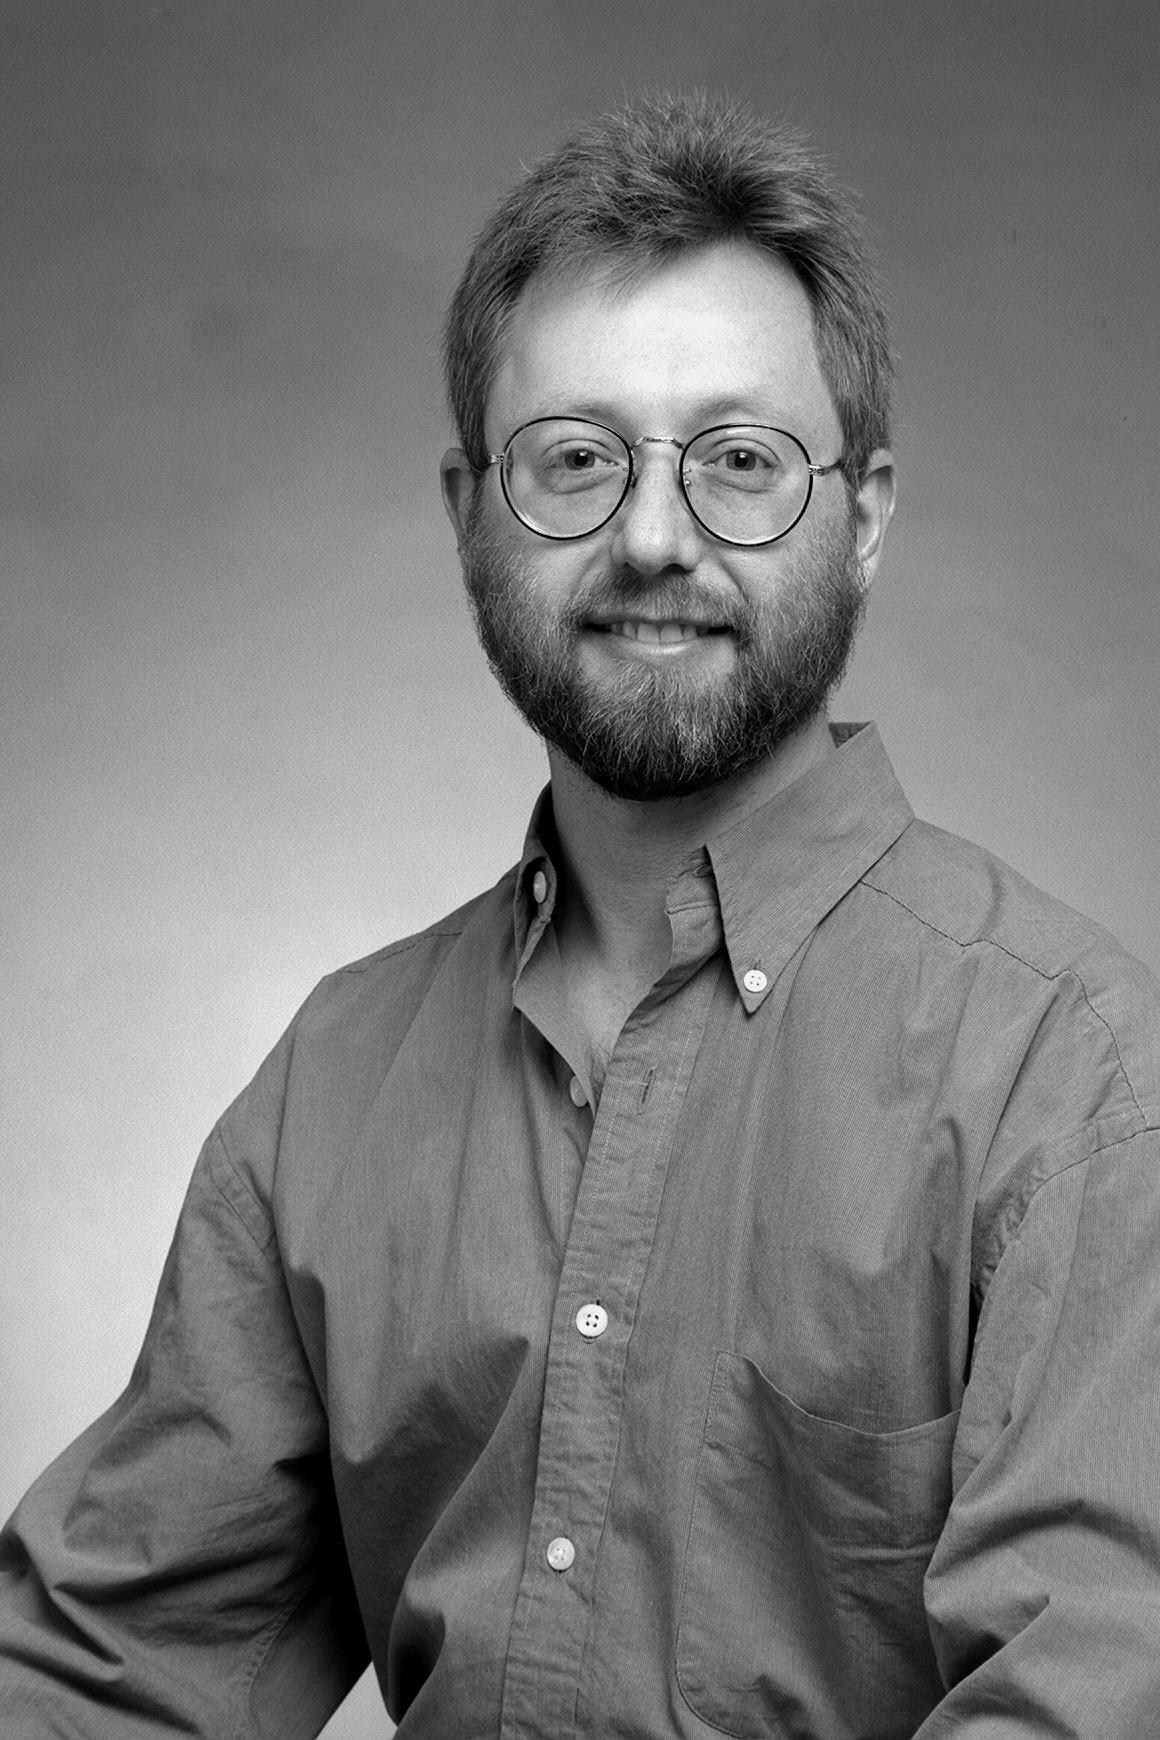 Profile picture of ANDREW Mishkin